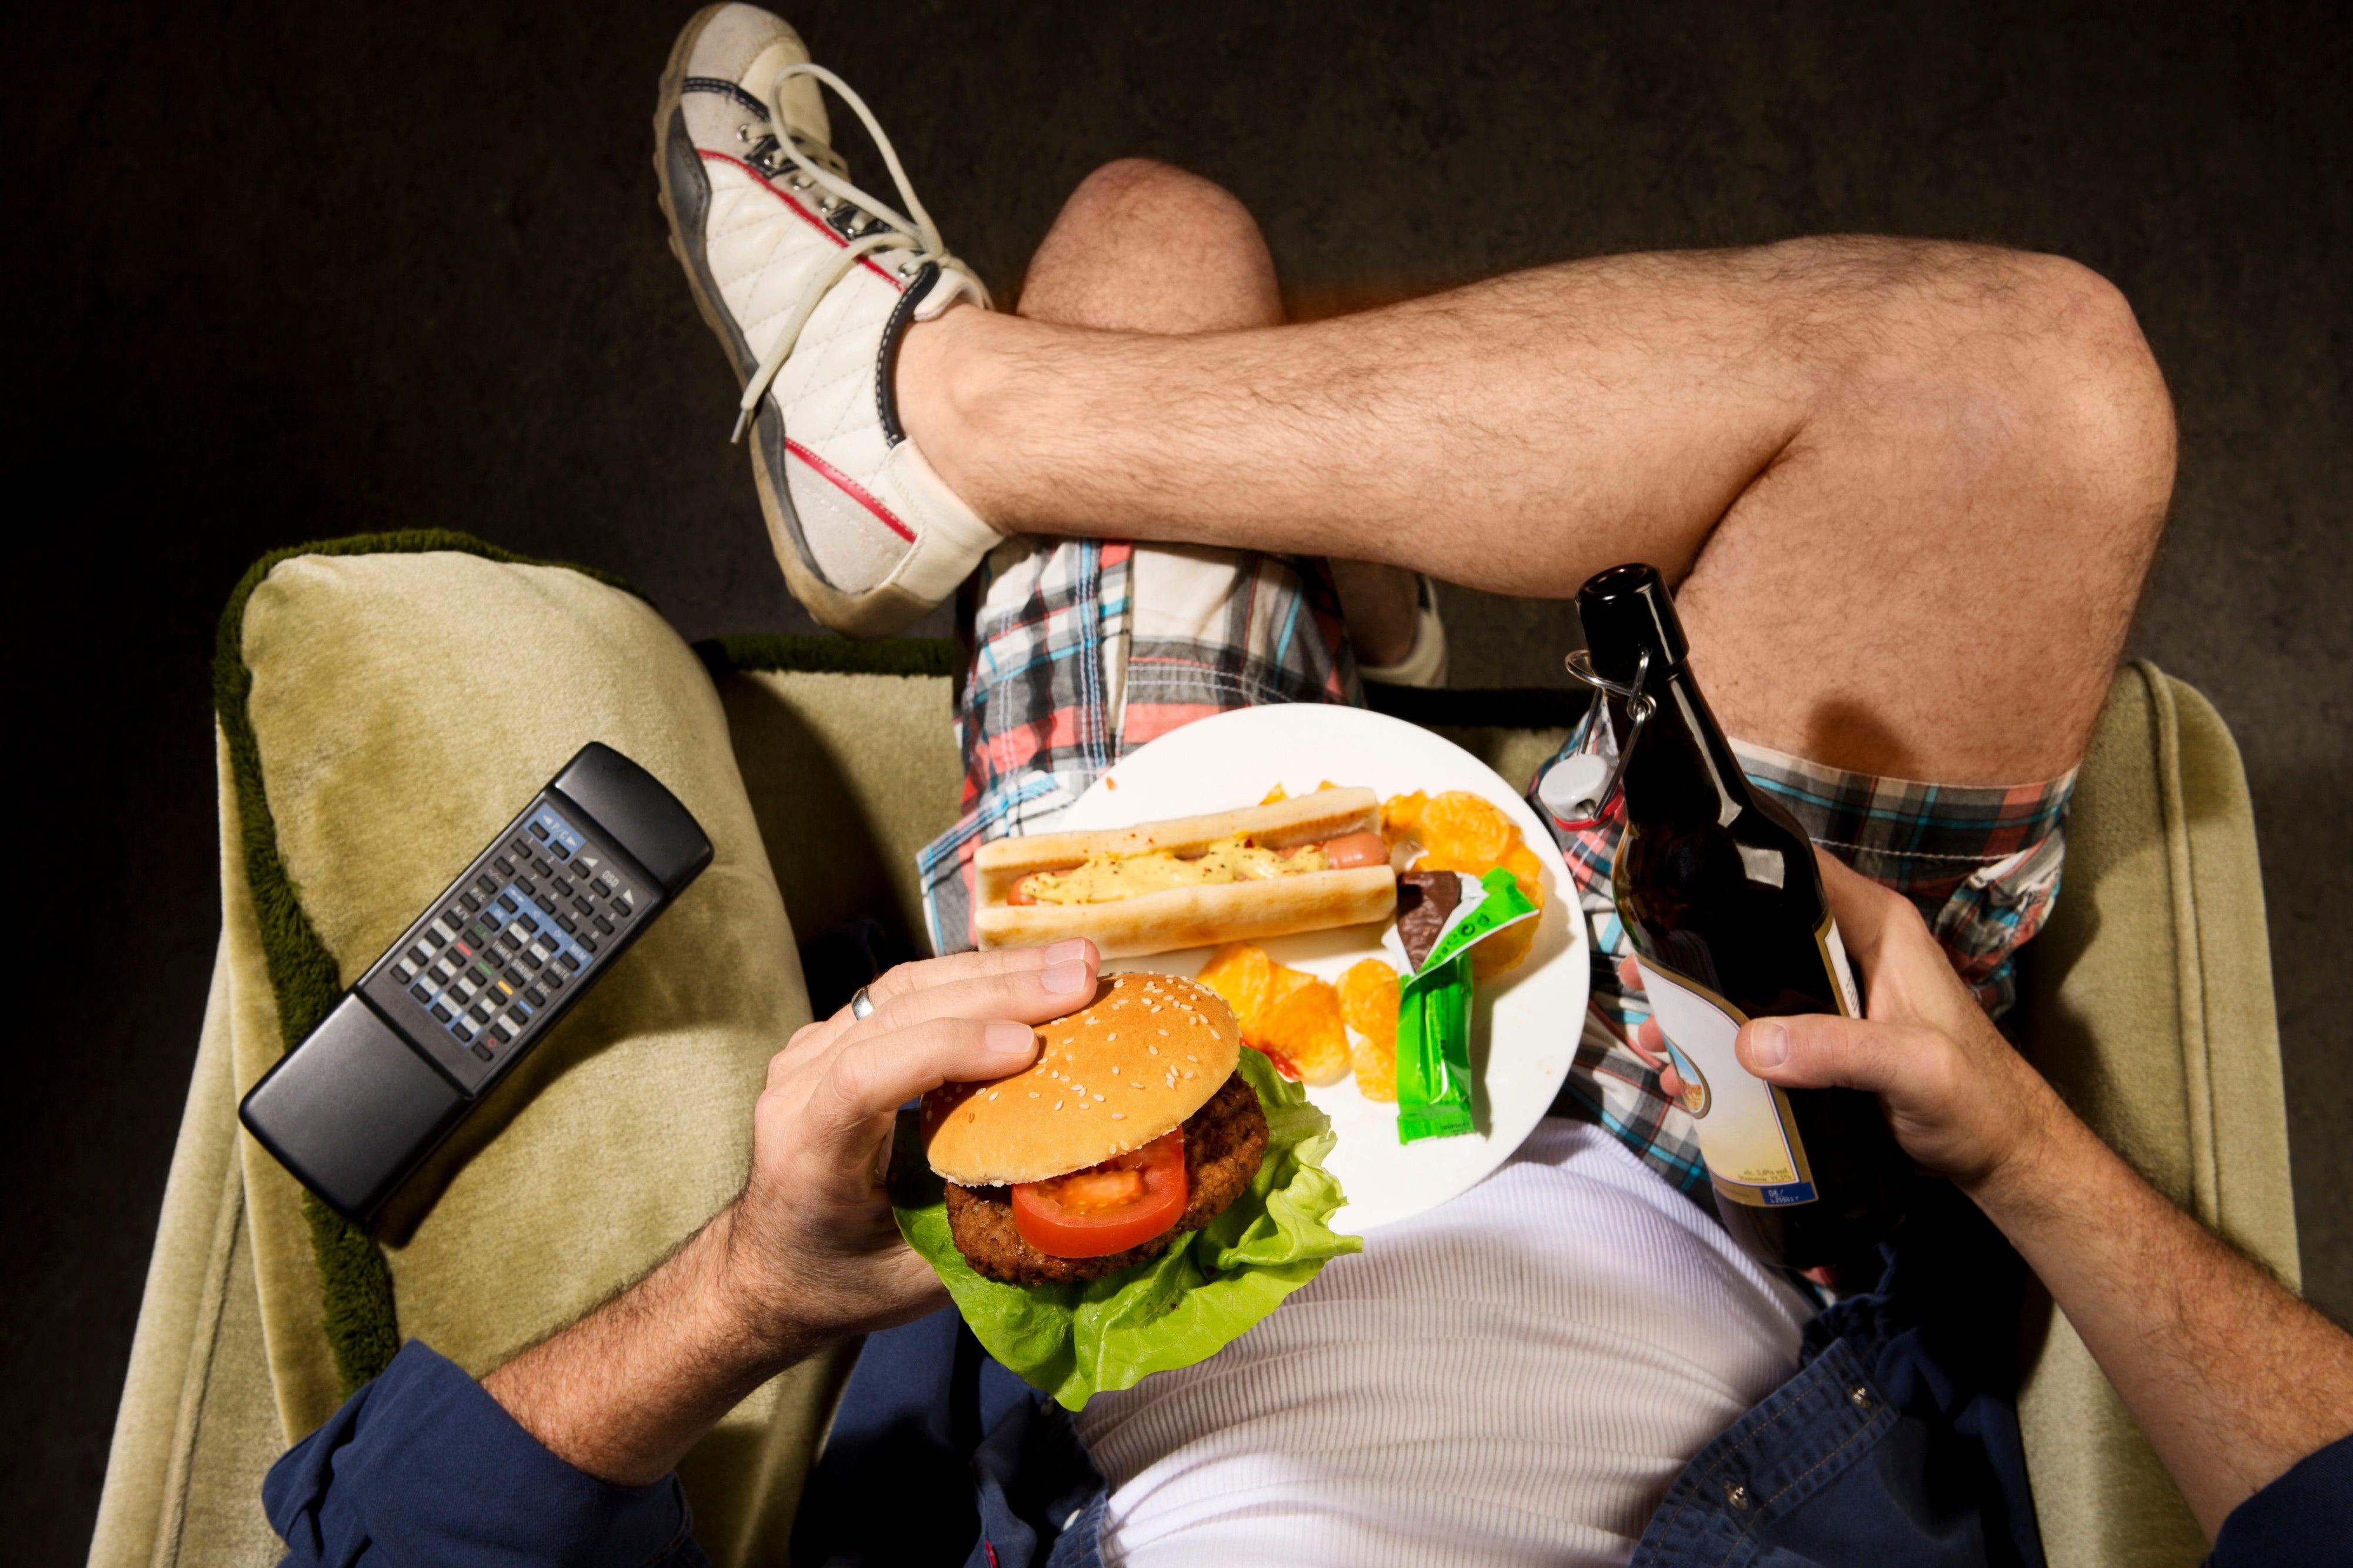 7 Ways to Have More Self-Discpline - Scientific American